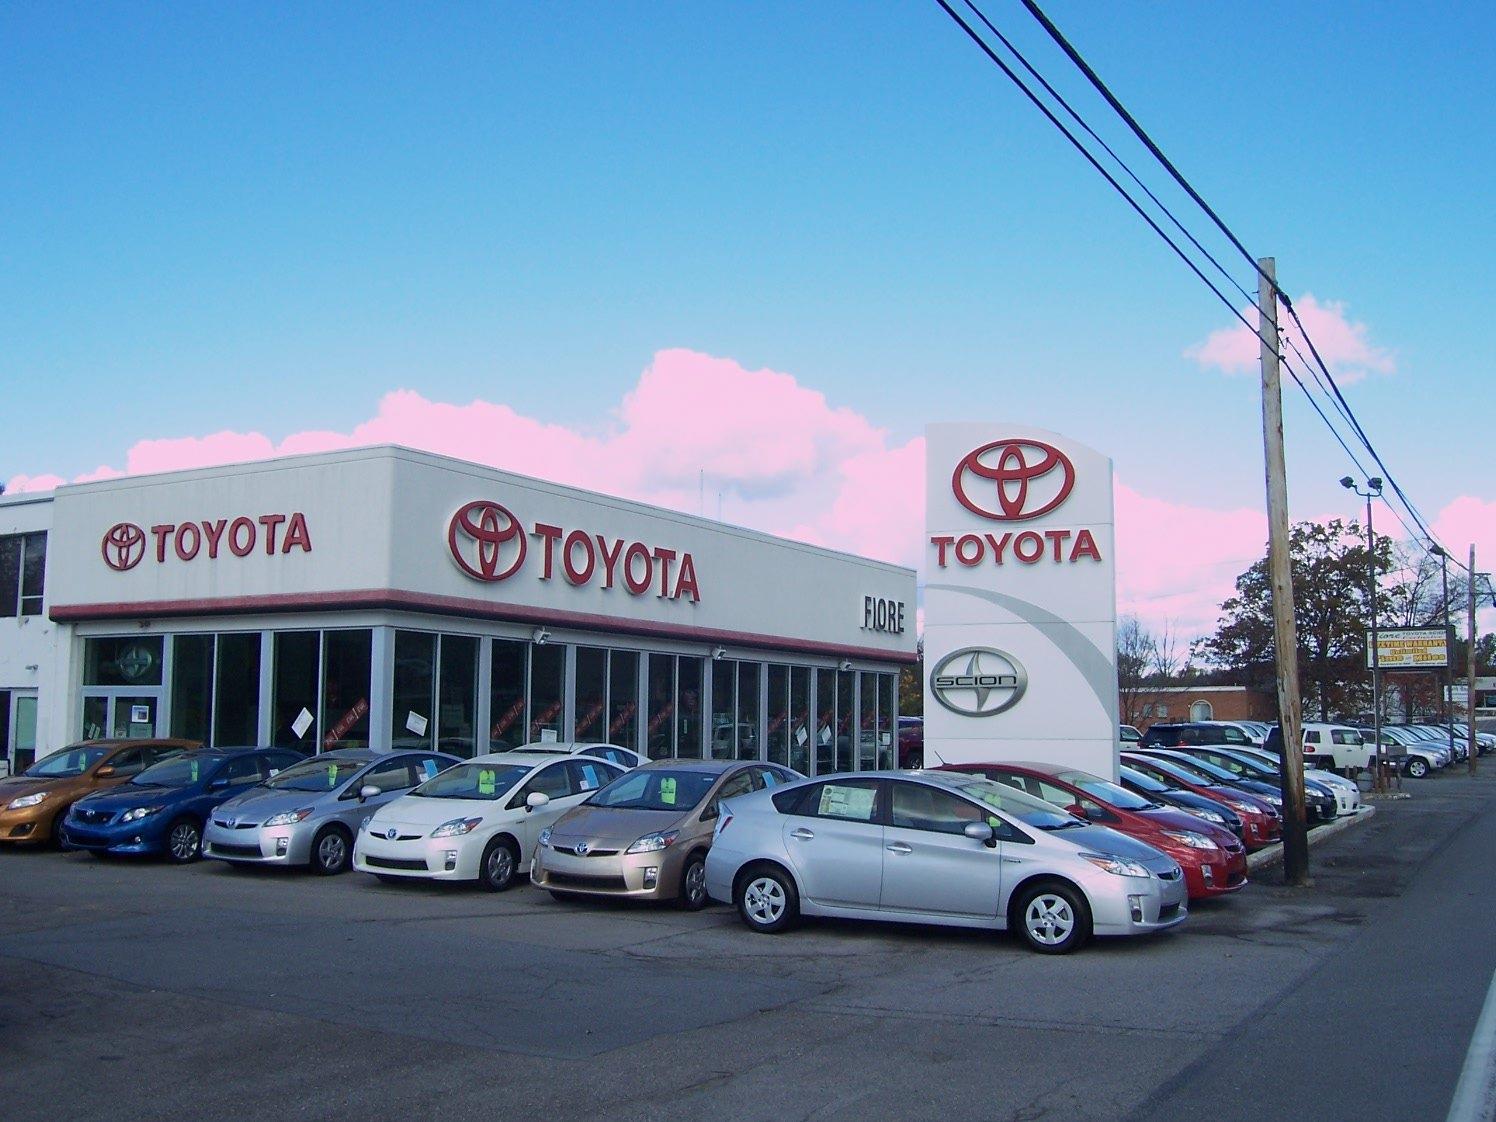 Fiore Toyota Hollidaysburg Pennsylvania Pa